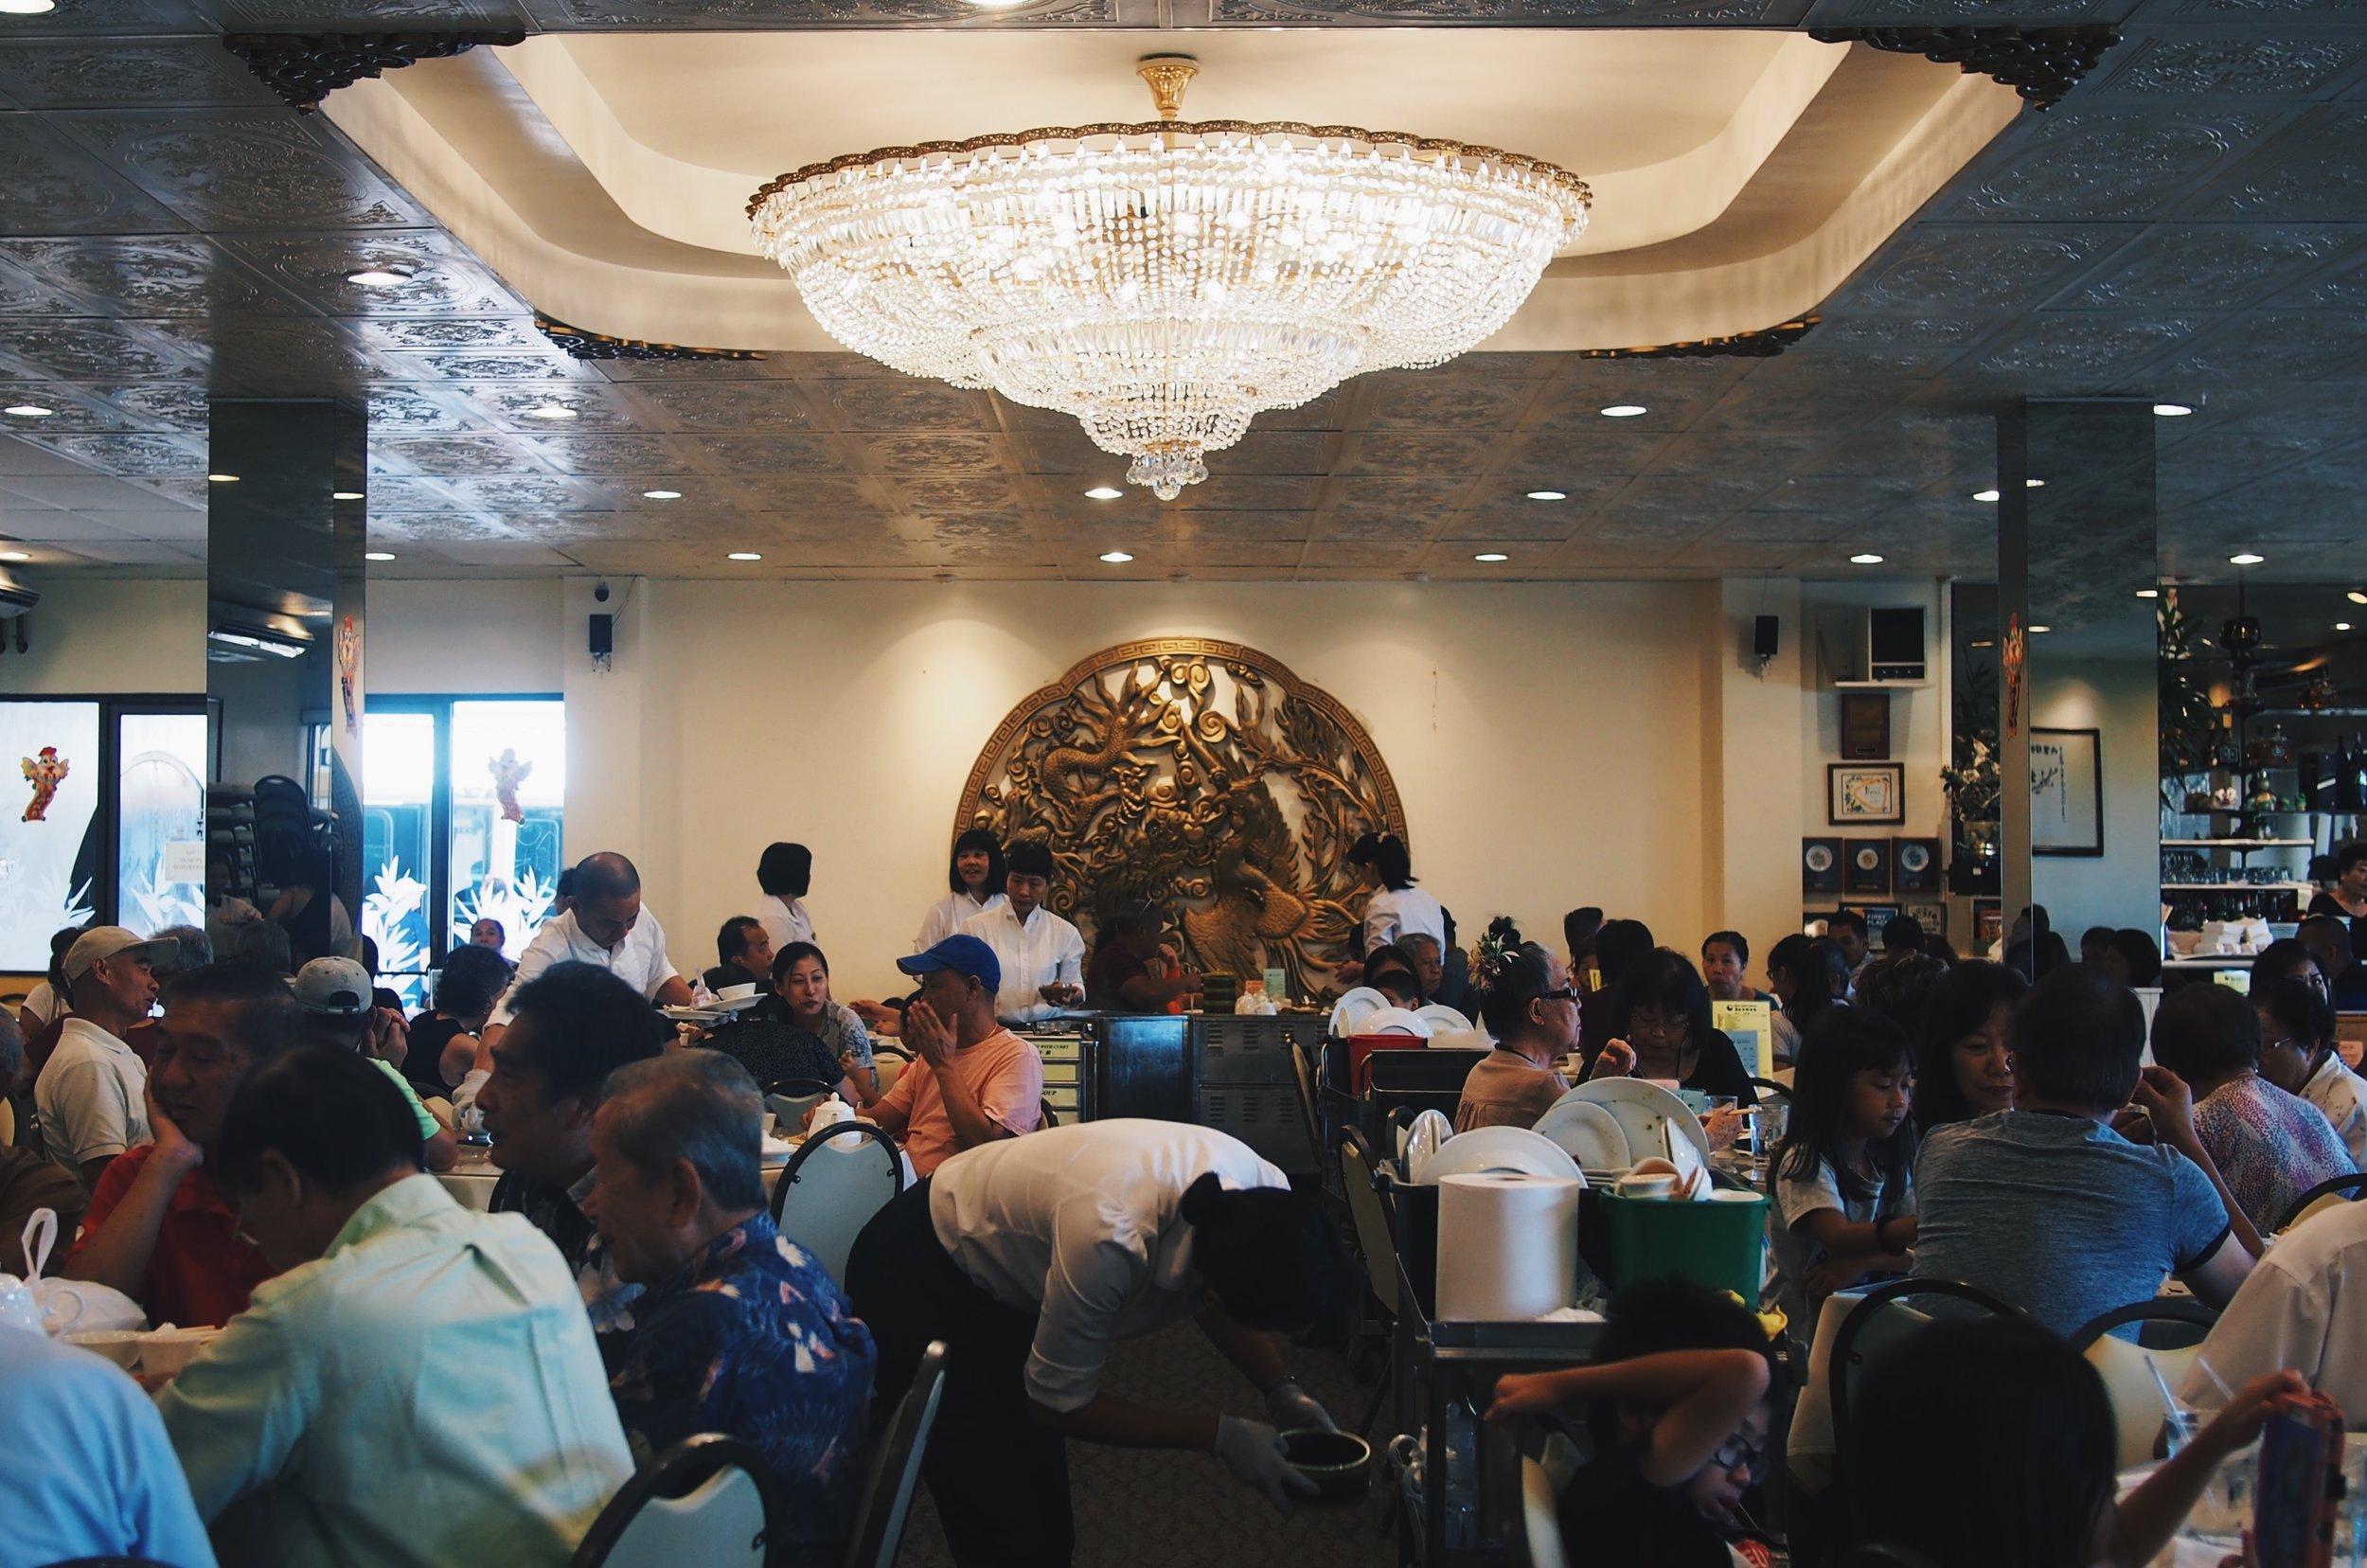 Chinese dim sum restaurant in Honolulu